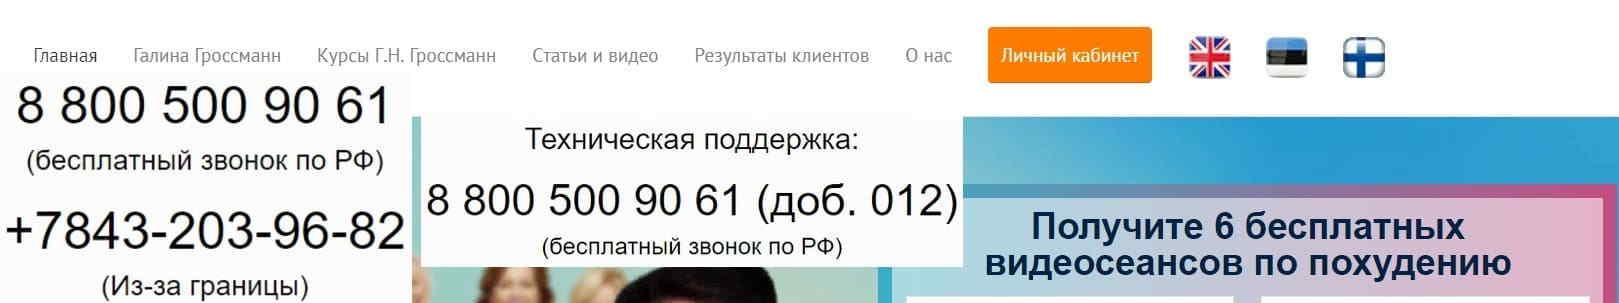 Худеем 99 Галина Гроссман